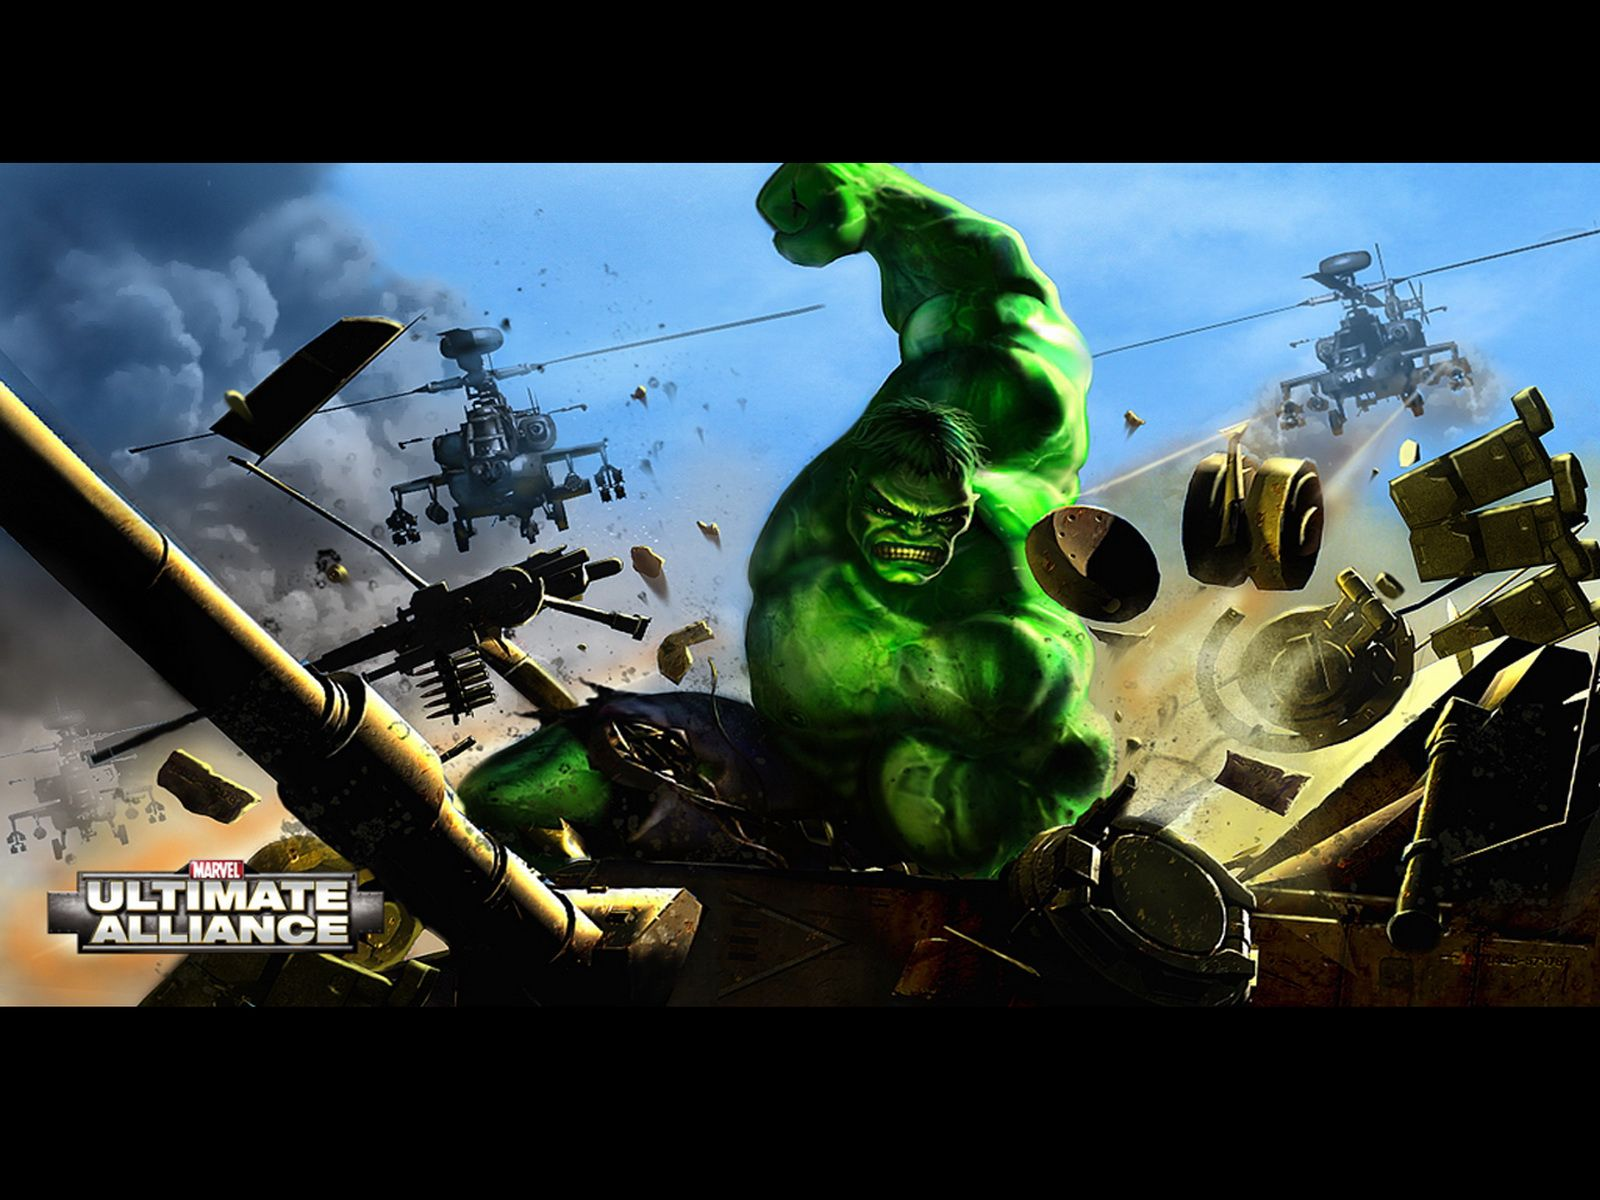 Hulk Wallpapers Free Download Marvel Ultimate Alliance Comics 1600x1200 Wallpaper Teahub Io